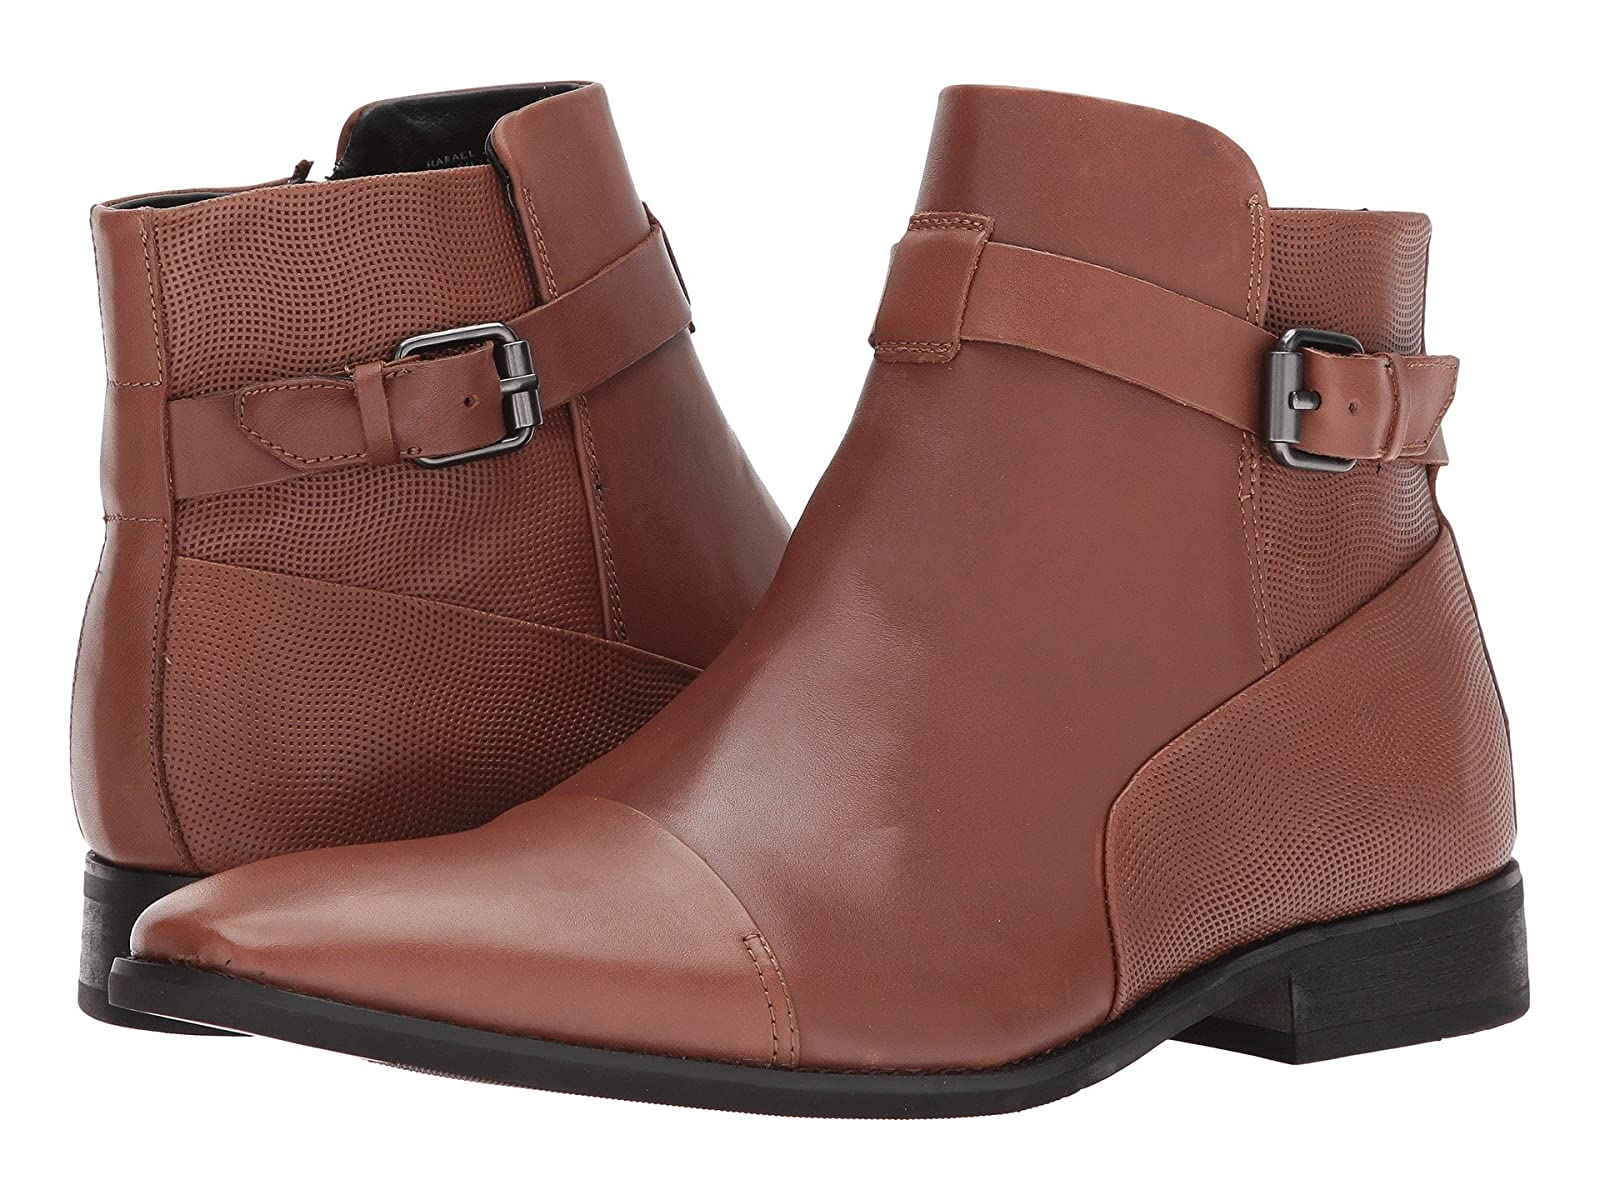 Calvin Klein RafaelCheap and distinctive eye-catching shoes